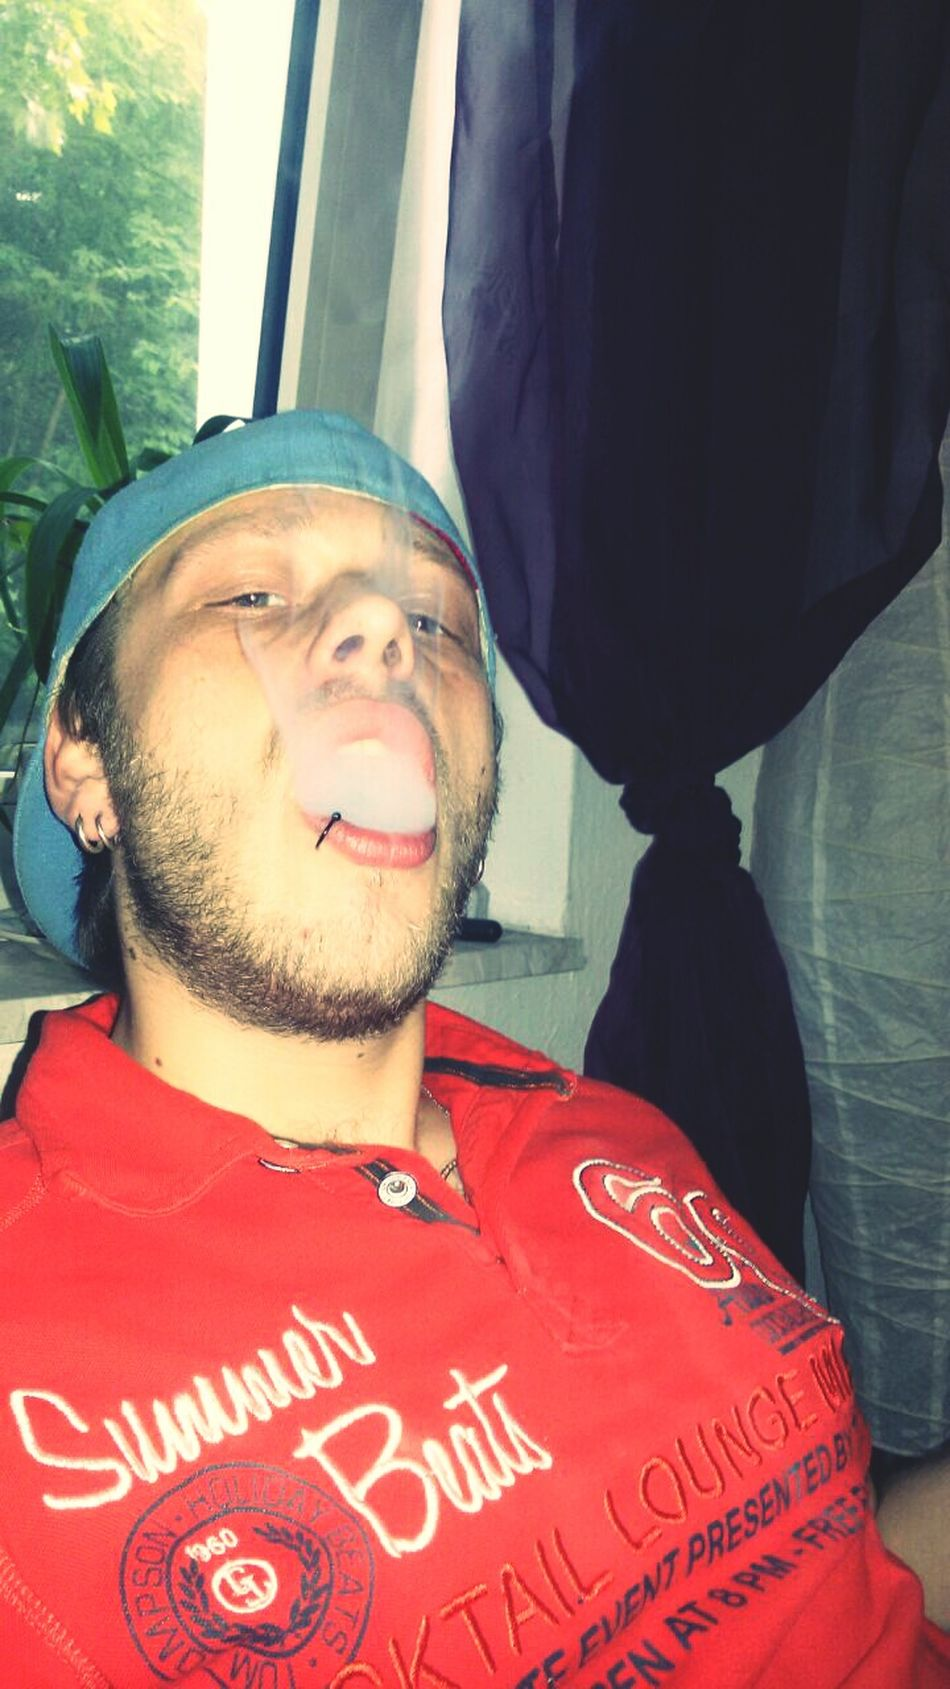 Smoking Weed Smokeweedeveryday Duisburg | Germany That's Me Smoker